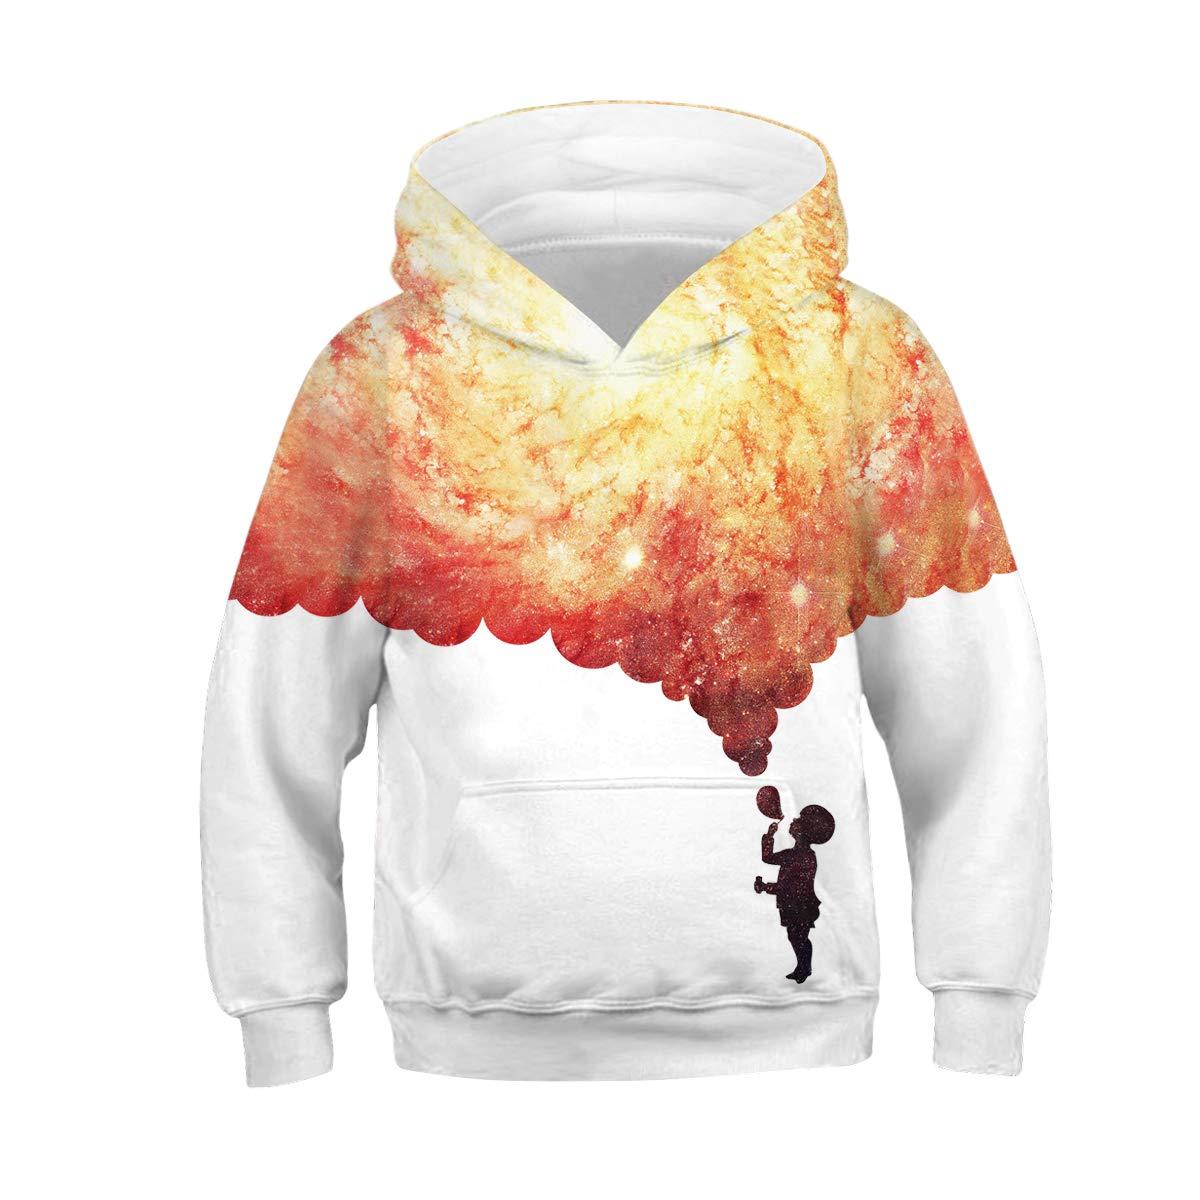 URVIP 3-13 Years Unisex Kids Hoodies Sweatshirt 3D Print Pullover Clothes